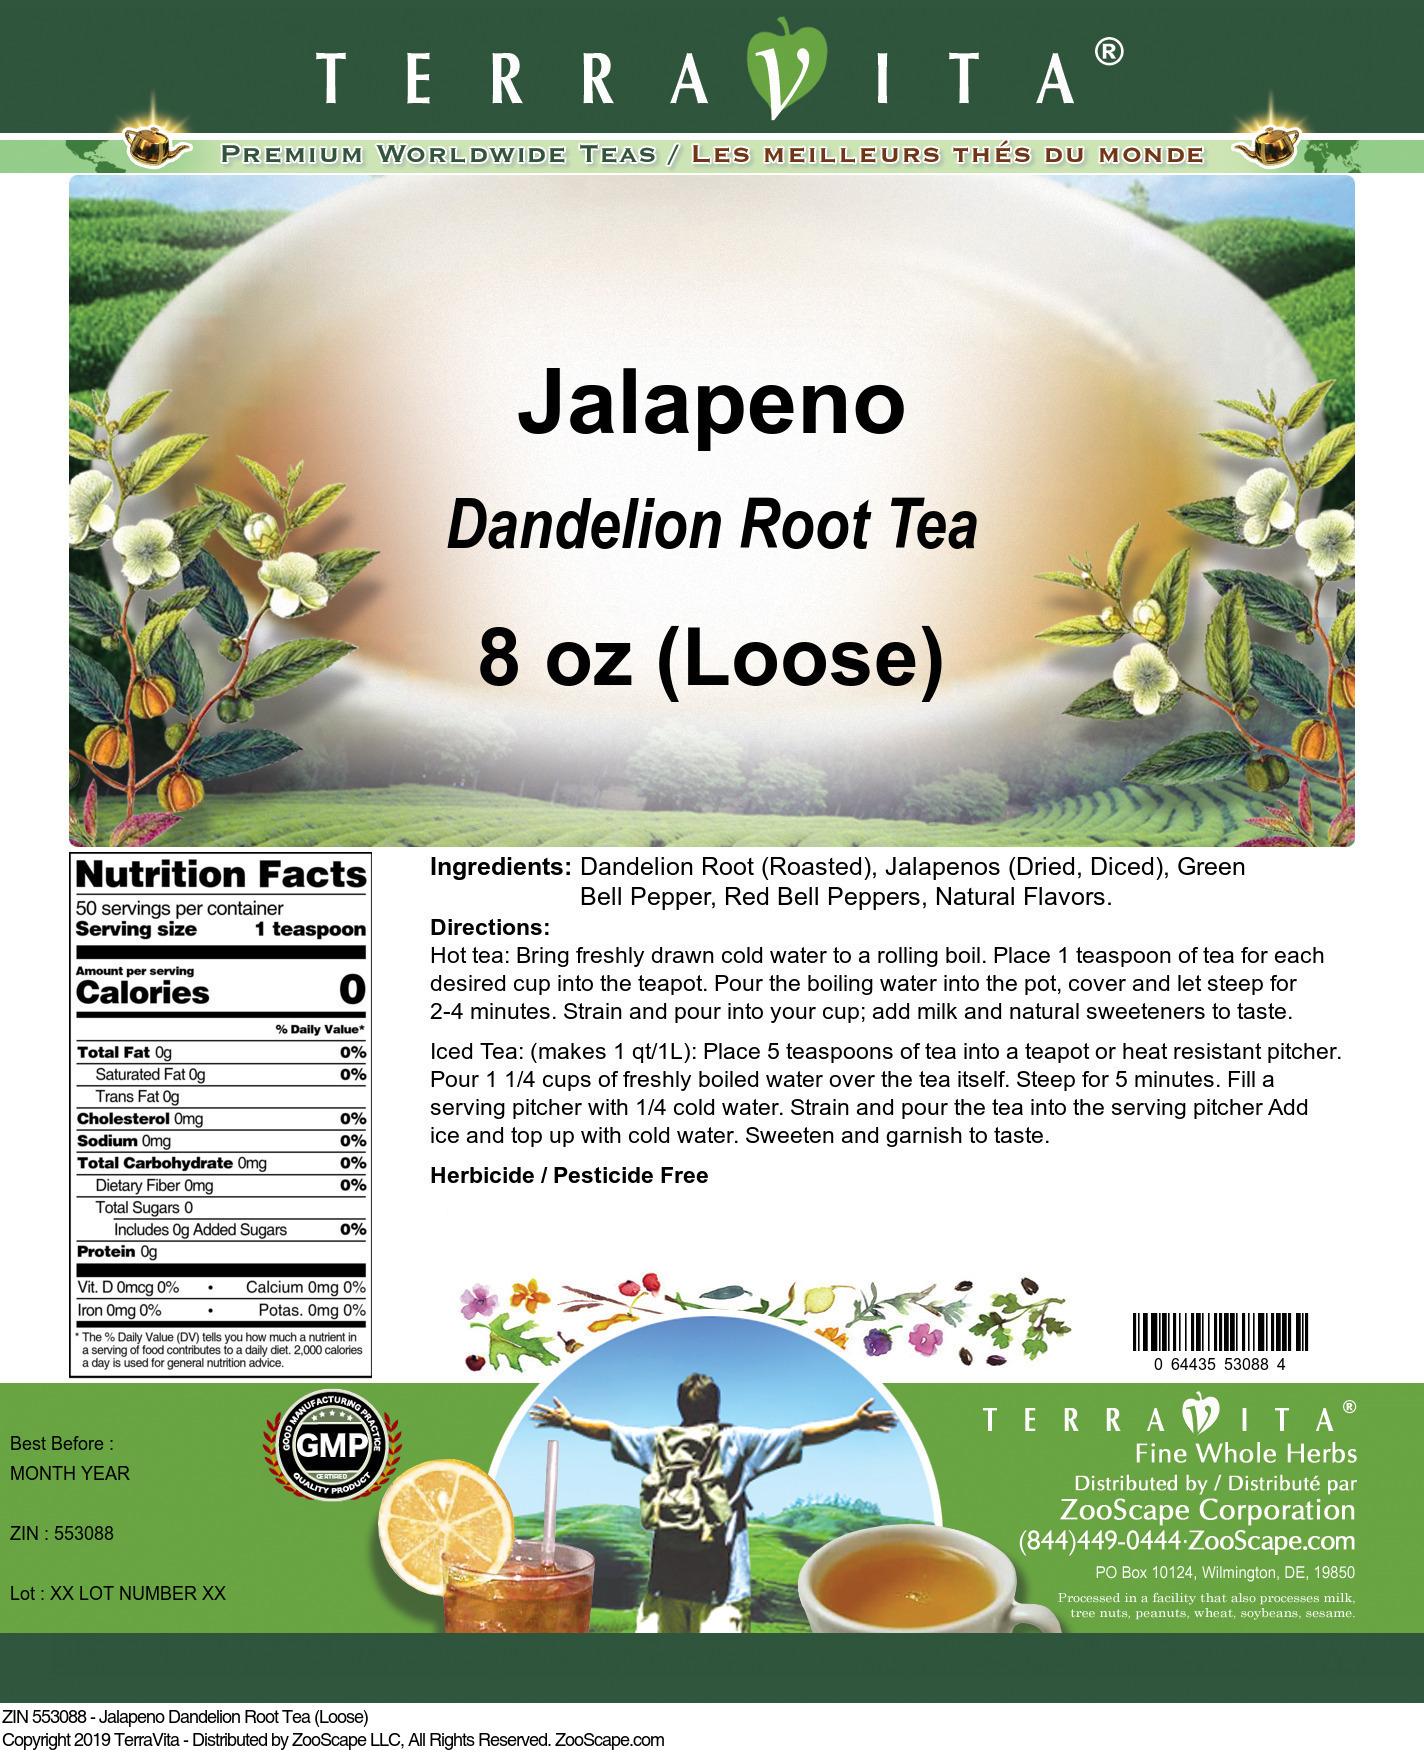 Jalapeno Dandelion Root Tea (Loose)